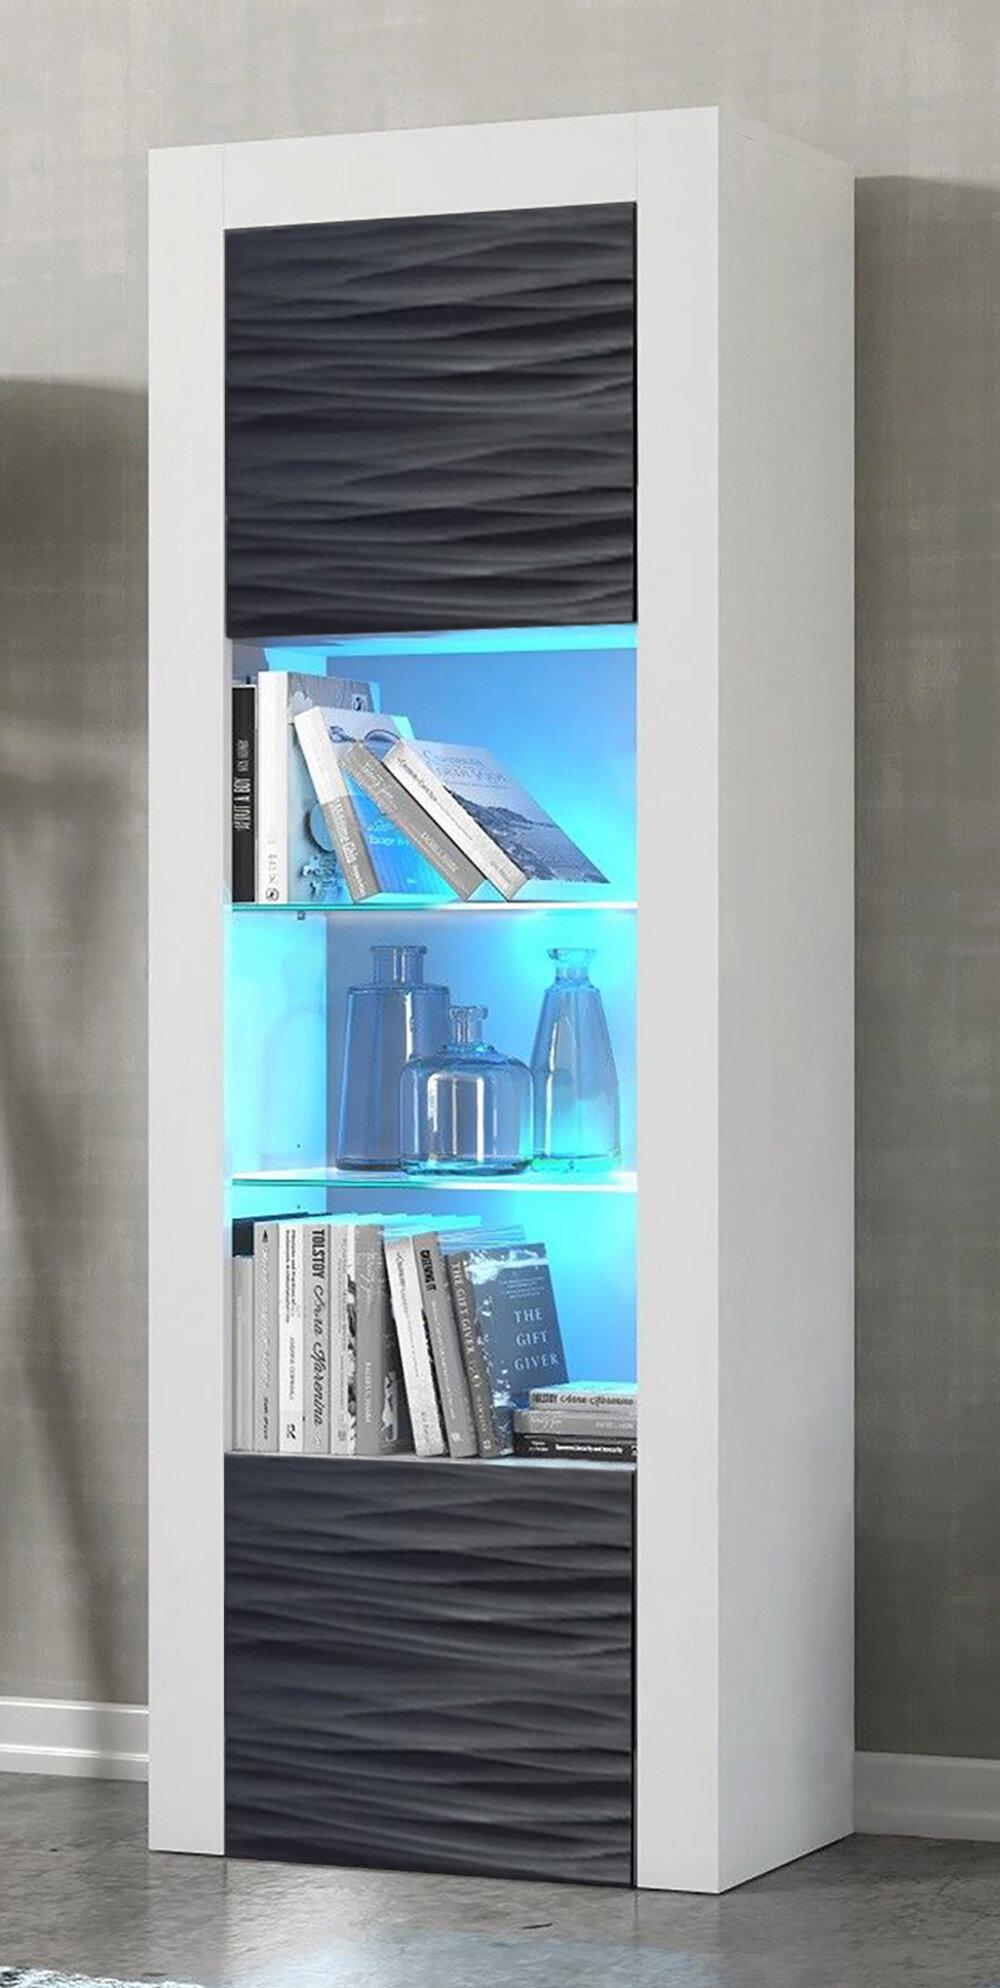 Ranallo Wavy Fronts Matte Body Barrister Bookcase